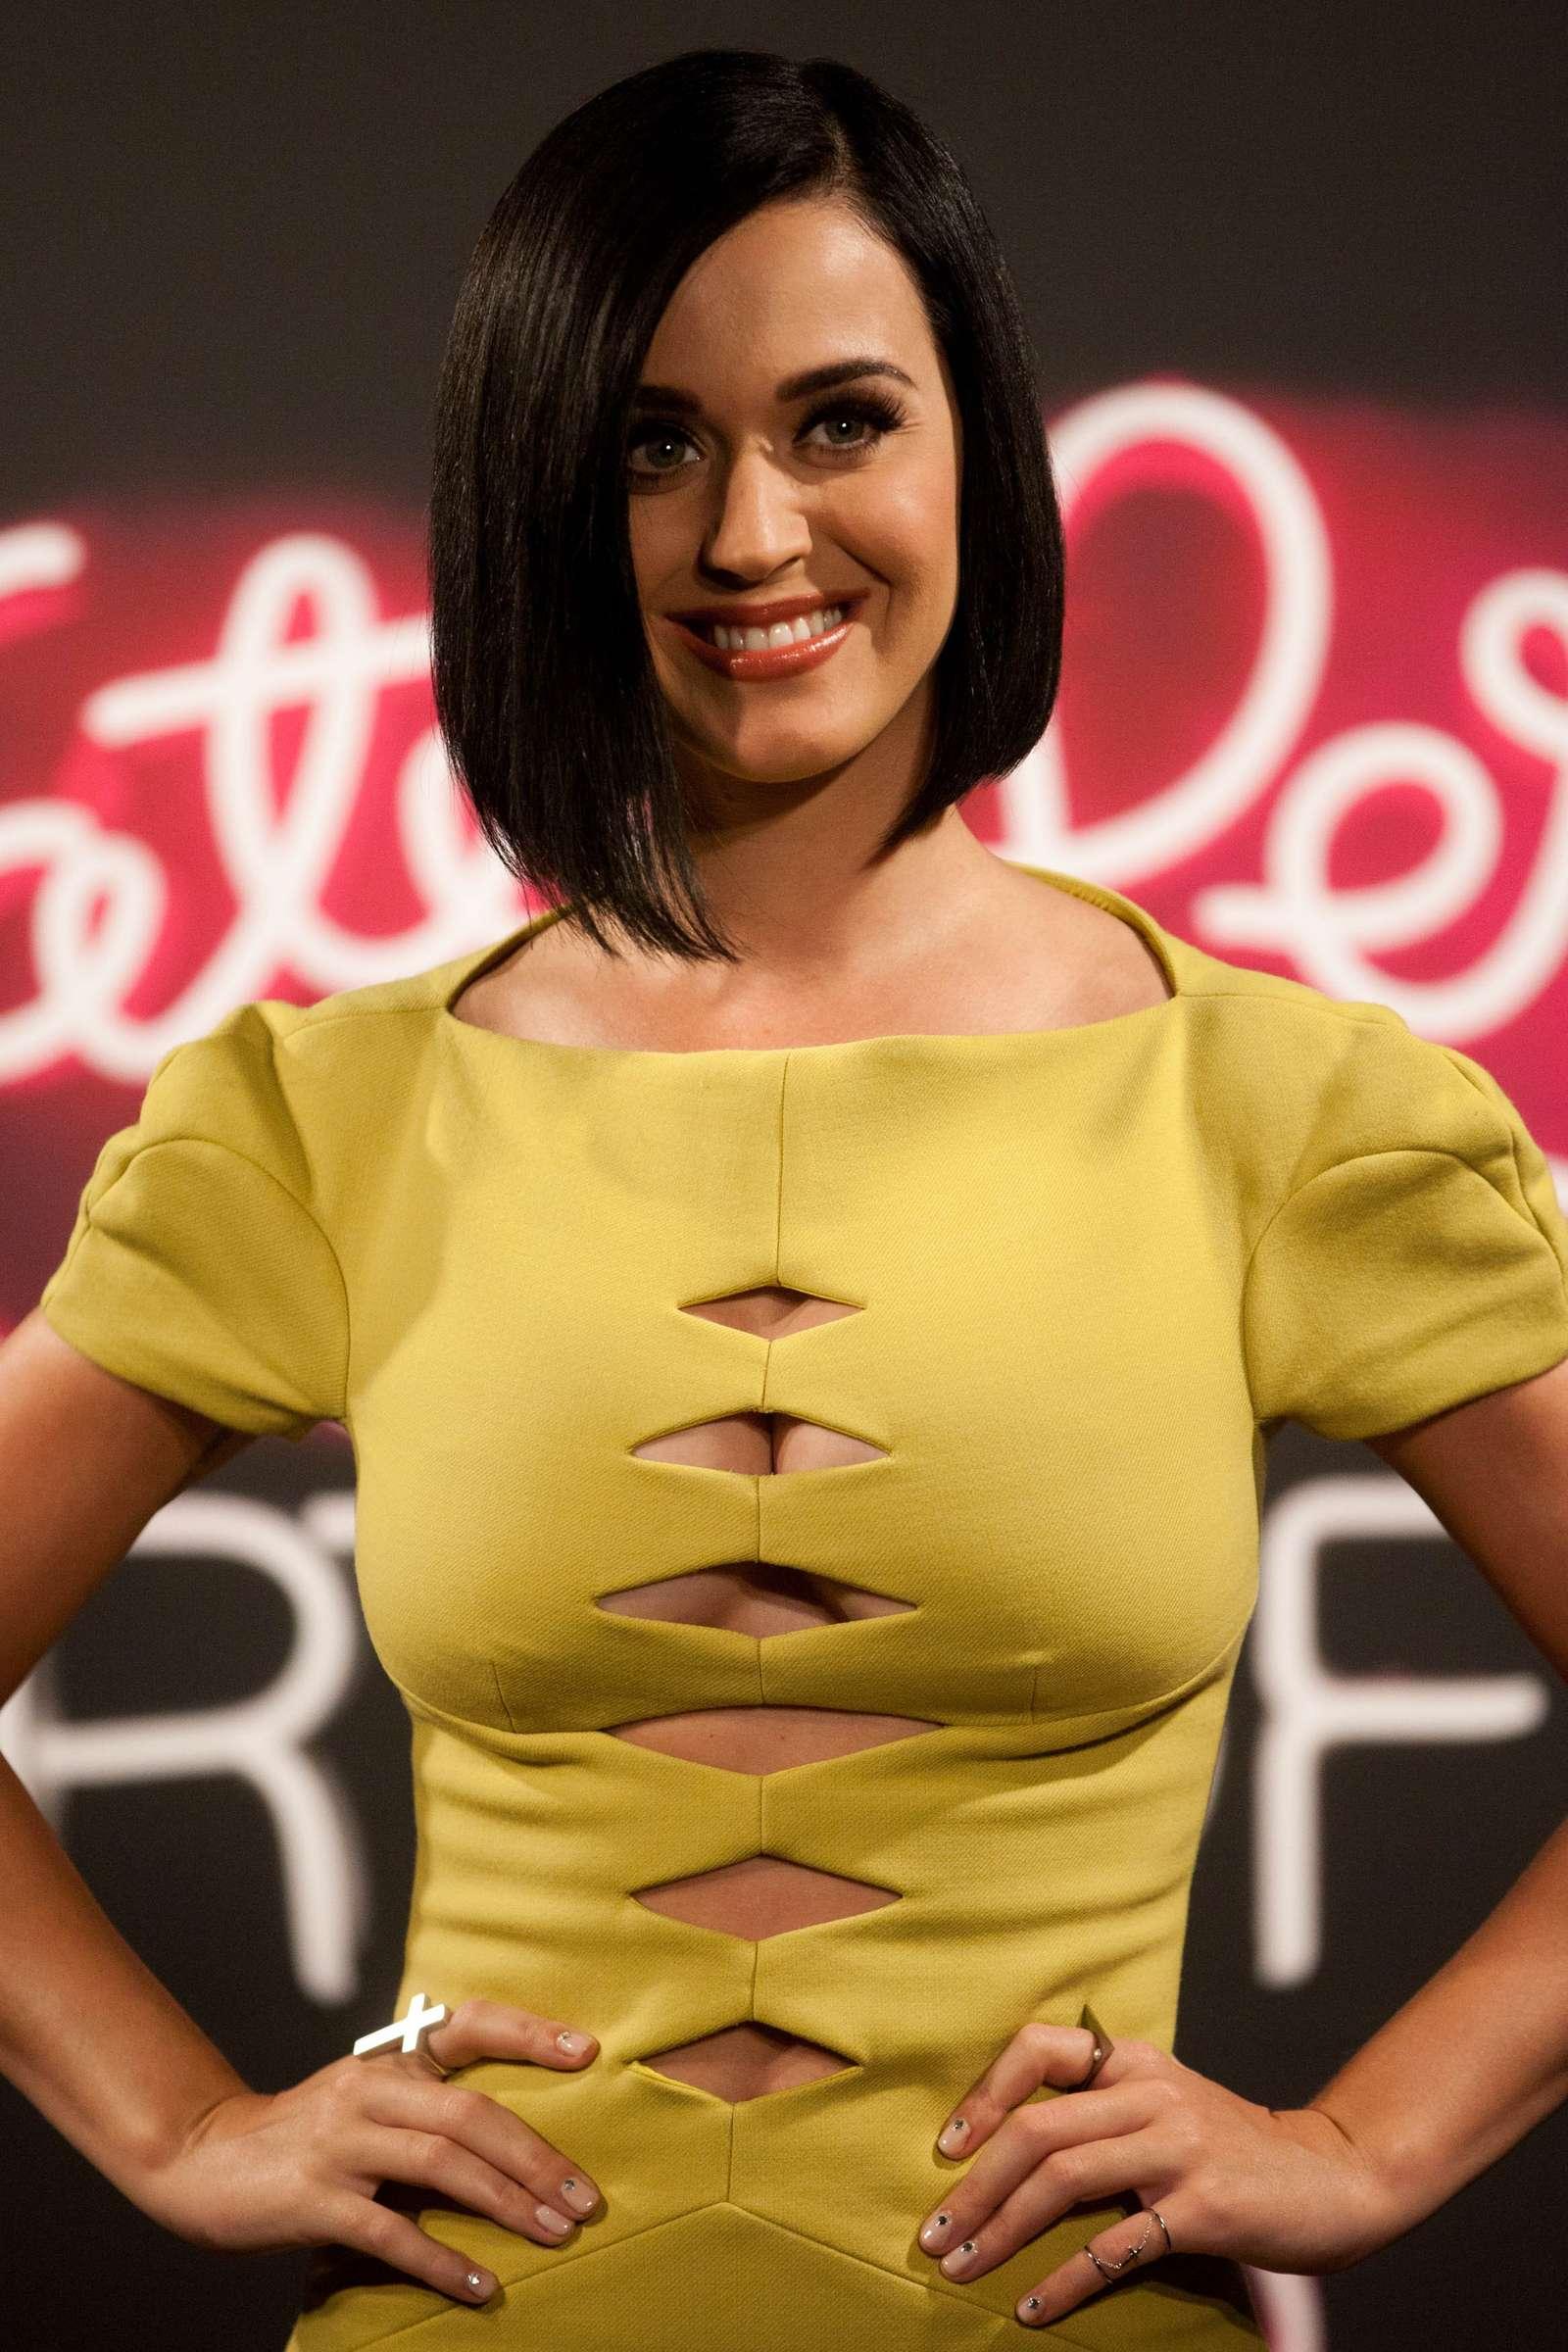 Katy Perry 2012 : katy-perry-photocall-part-of-me-in-rio-de-janeiro-16